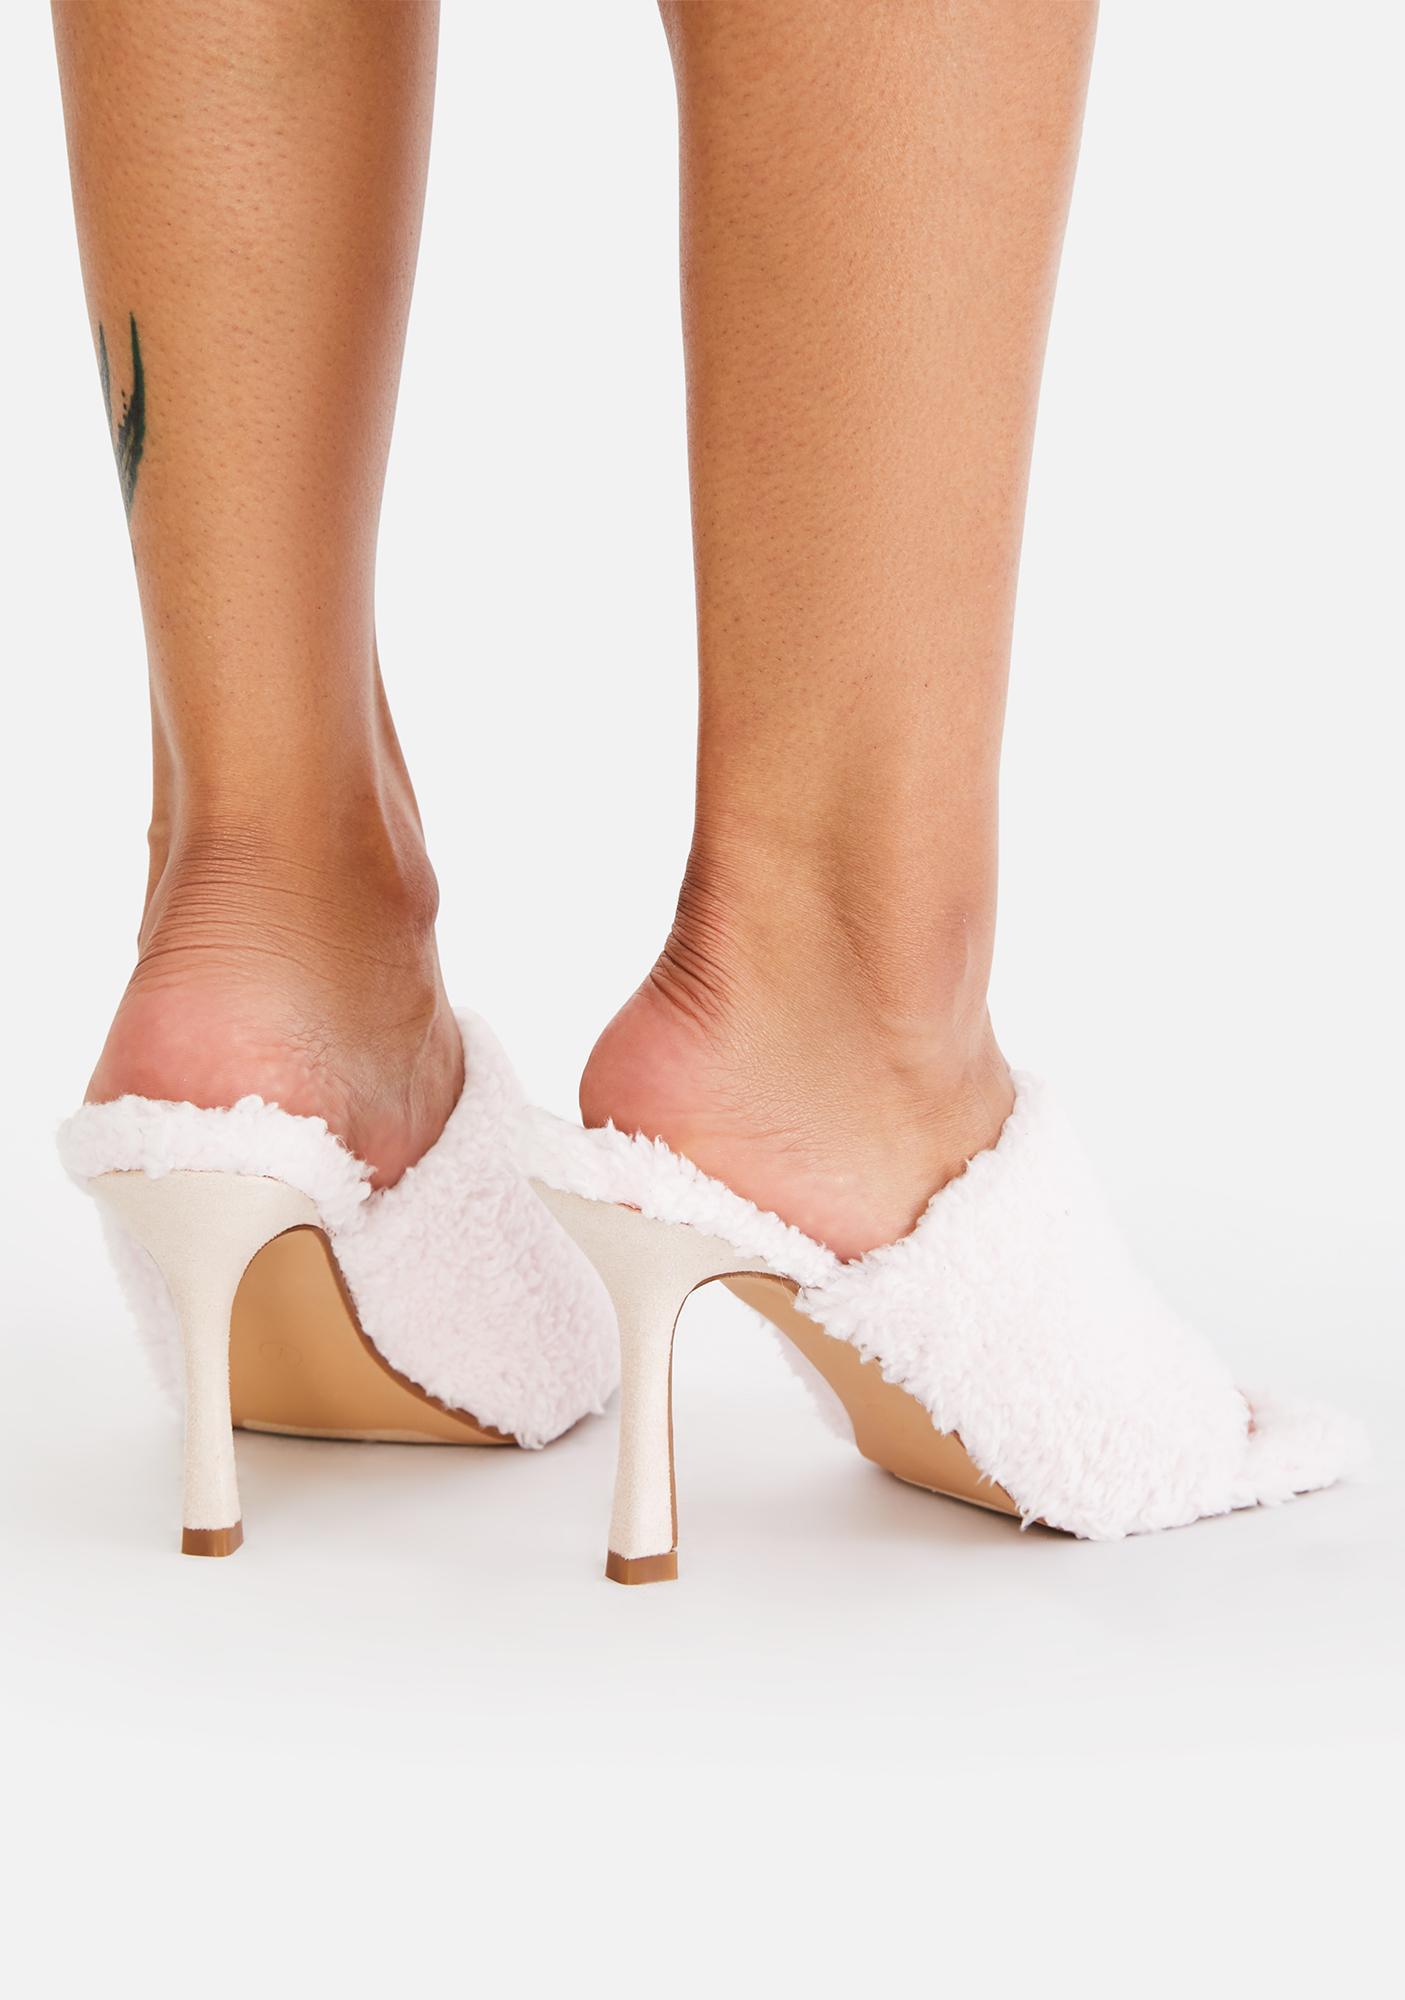 Pretty Princess And The Peep Toe Heels